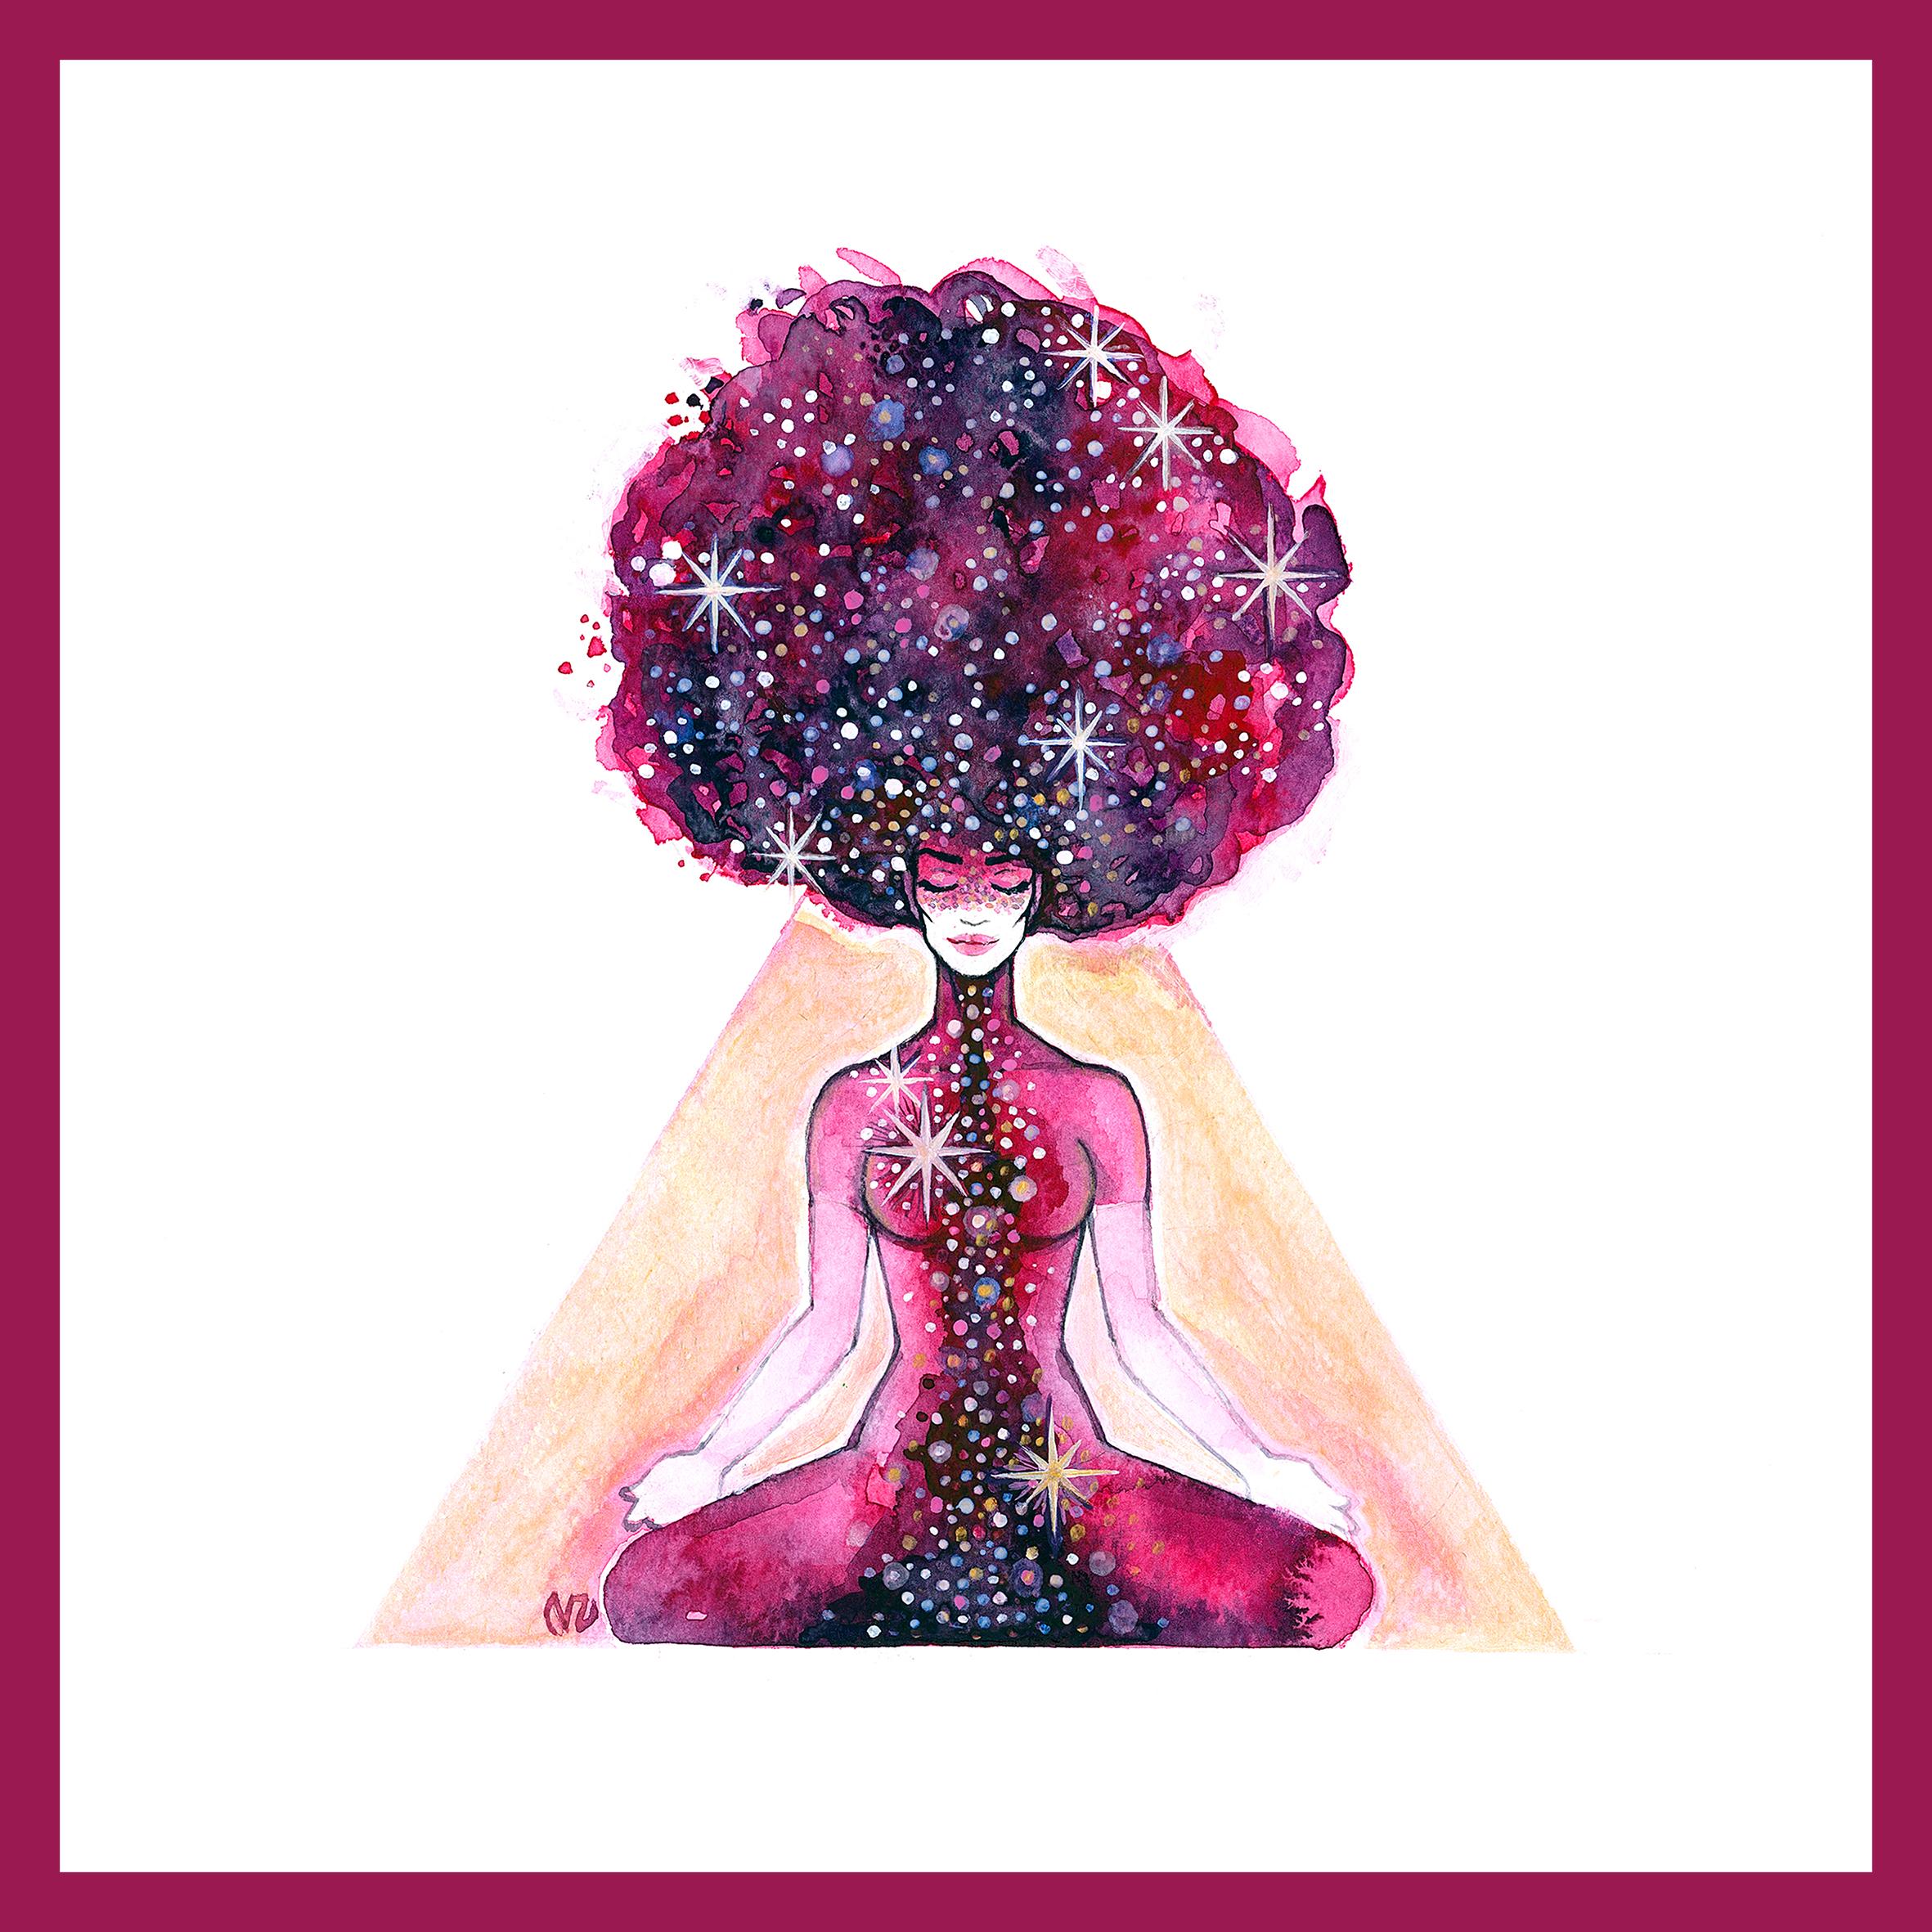 06.30x30-Galactic-ViorikaZagorowska-ArtForSale